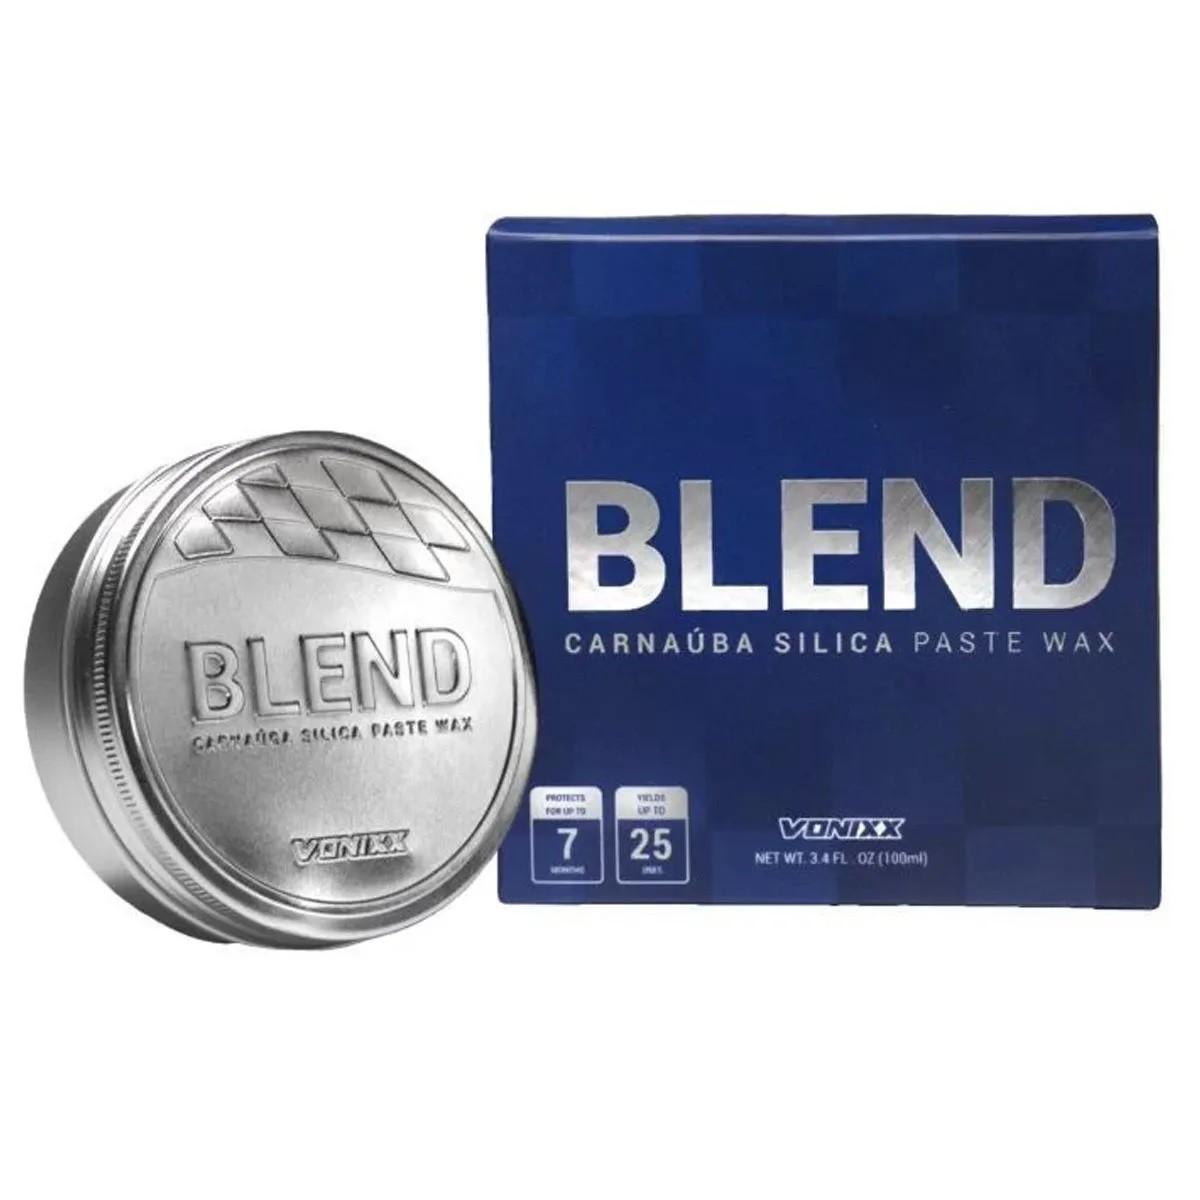 Cera de Carnaúba Paste Wax Blend 100ml Vonixx